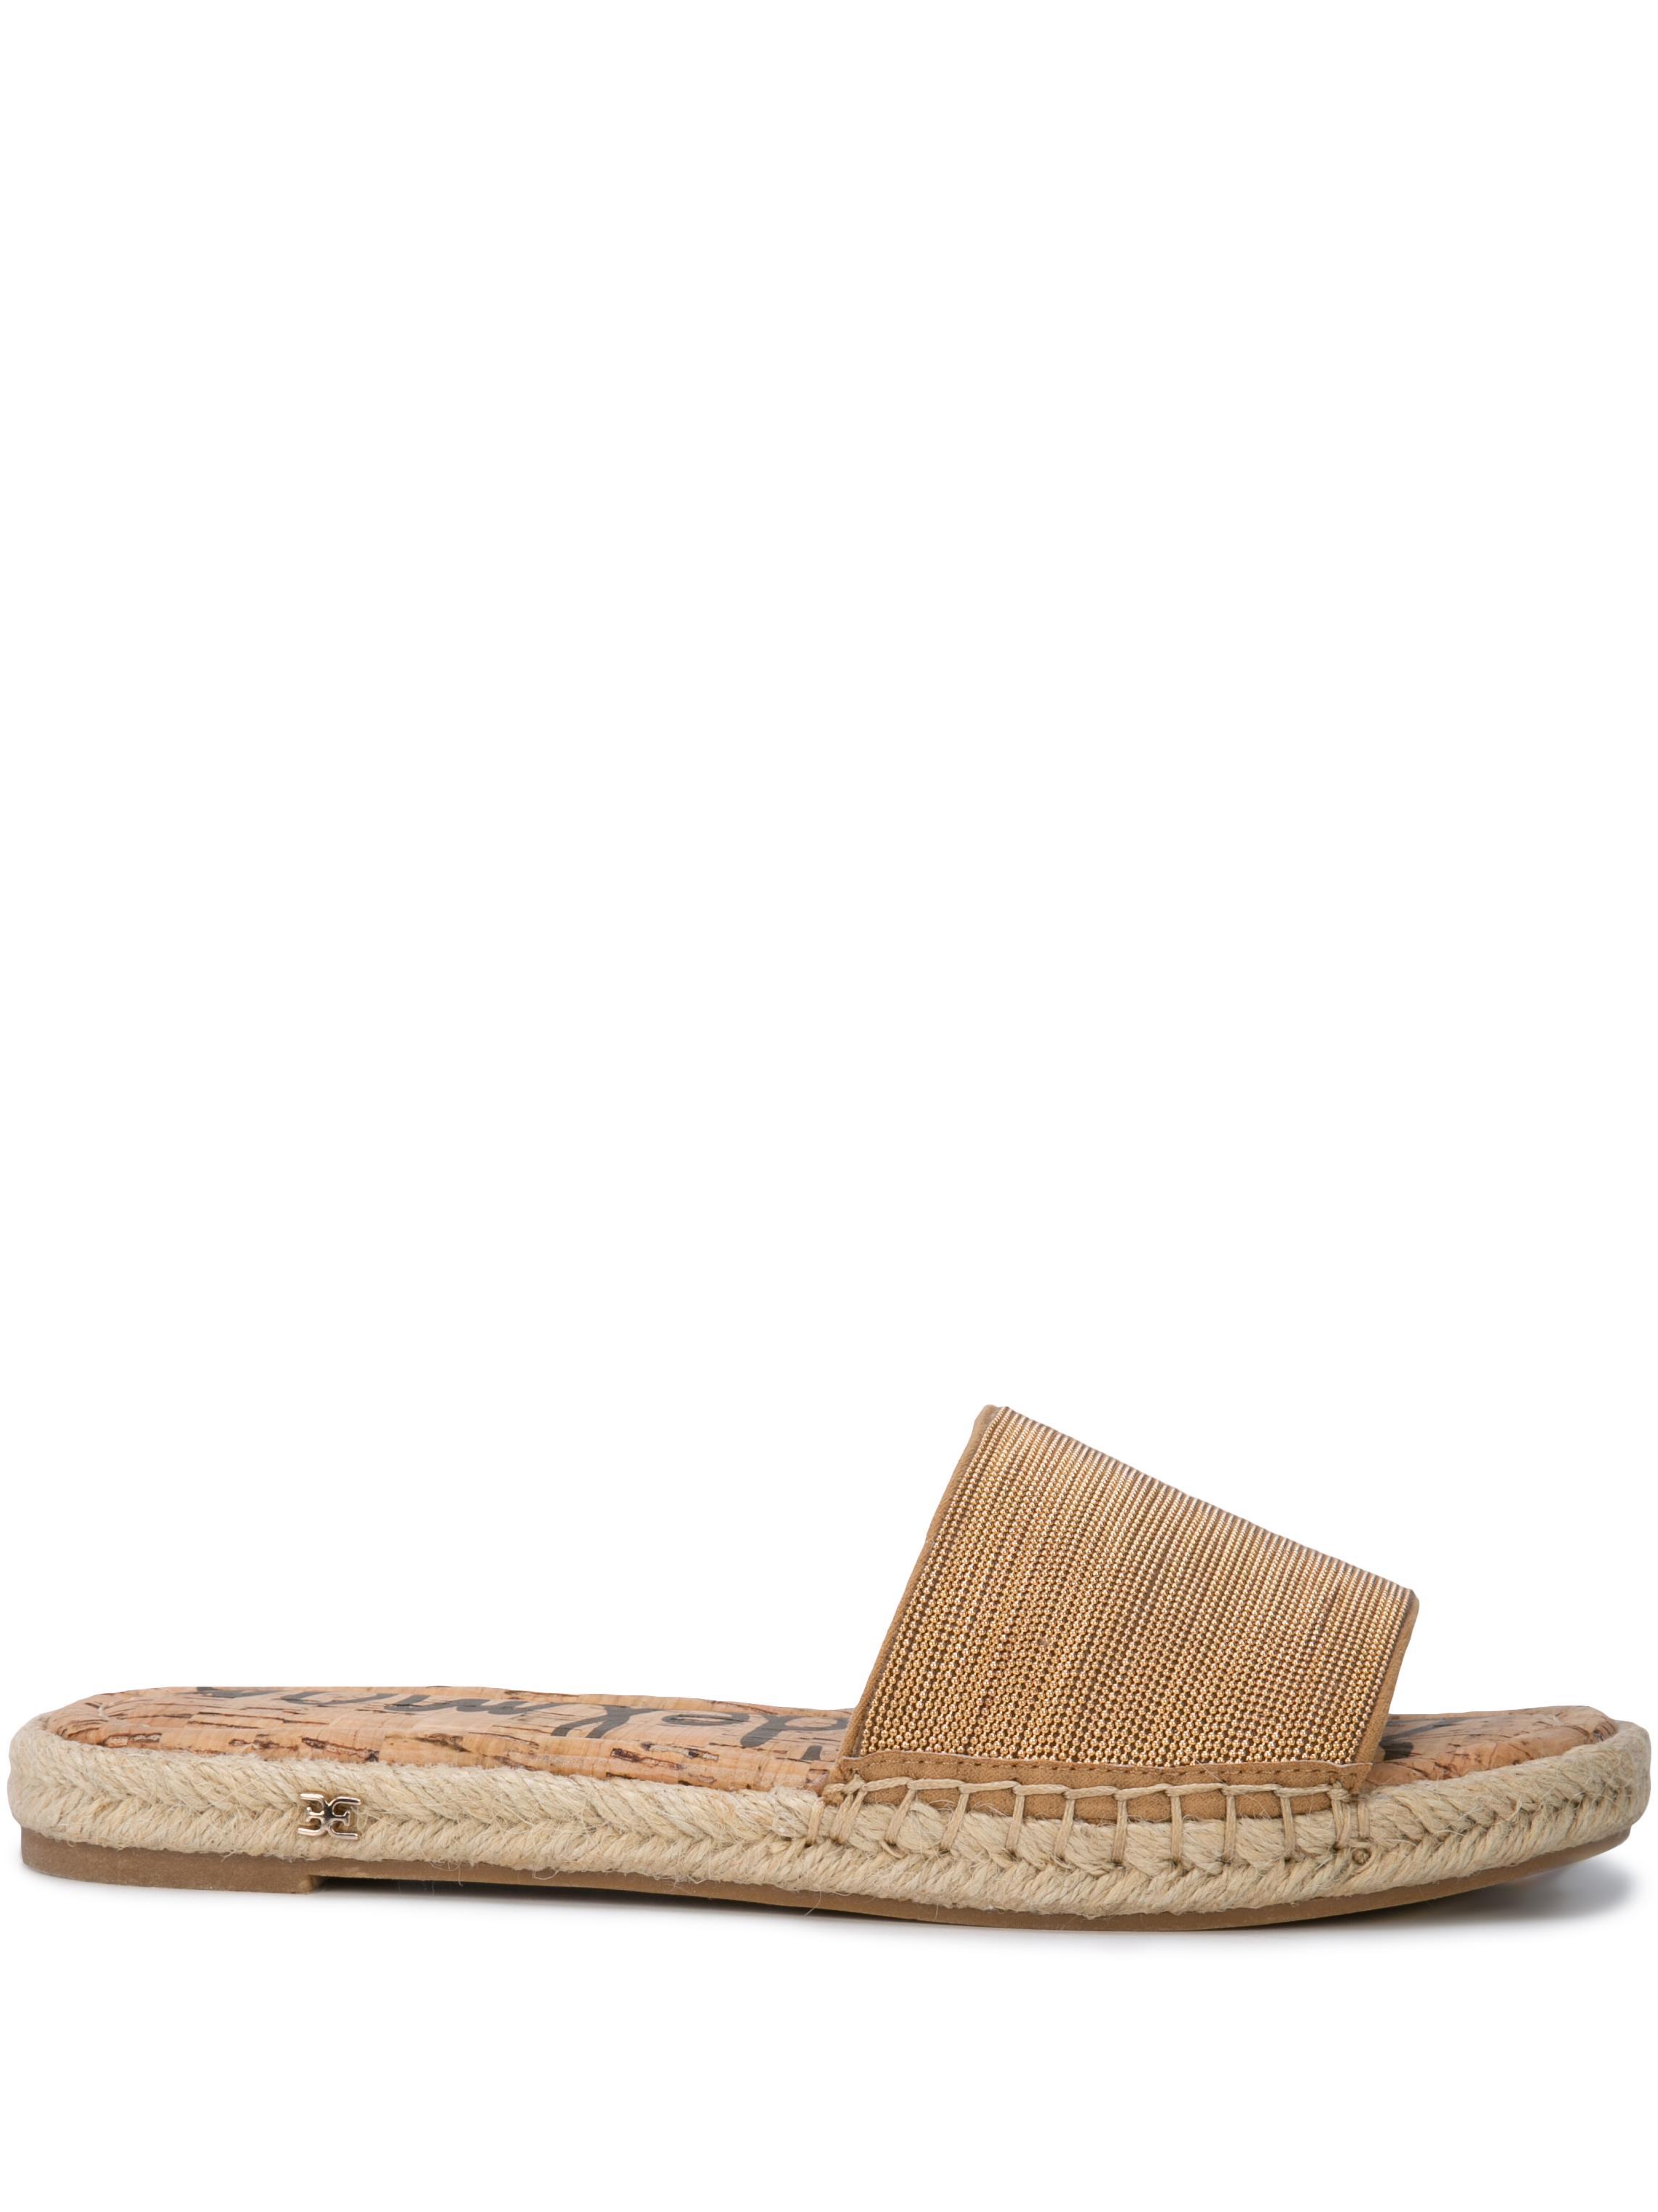 Suede/Metallic Flat Slide Sandal Item # ALUNA